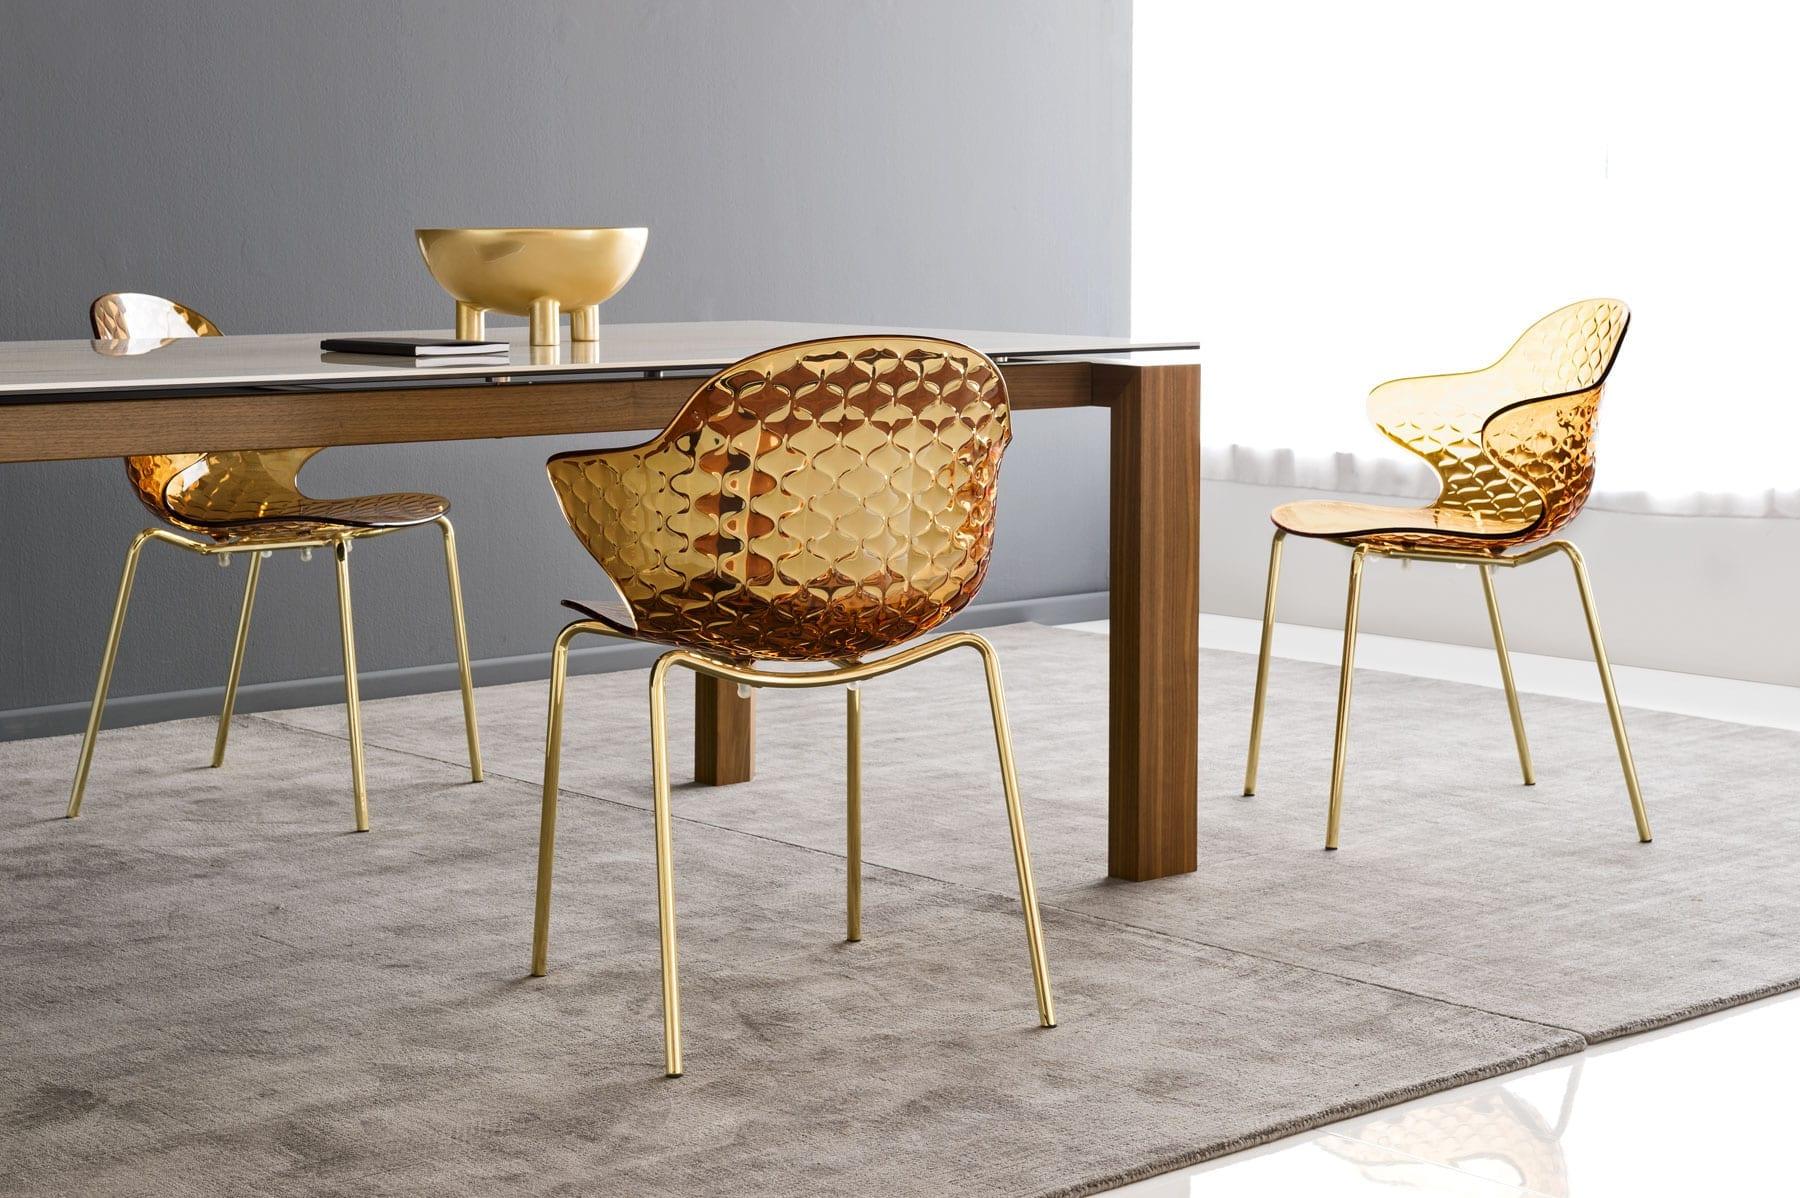 Calligaris saint tropez w dining chair mckenzie willis for Calligaris saint tropez